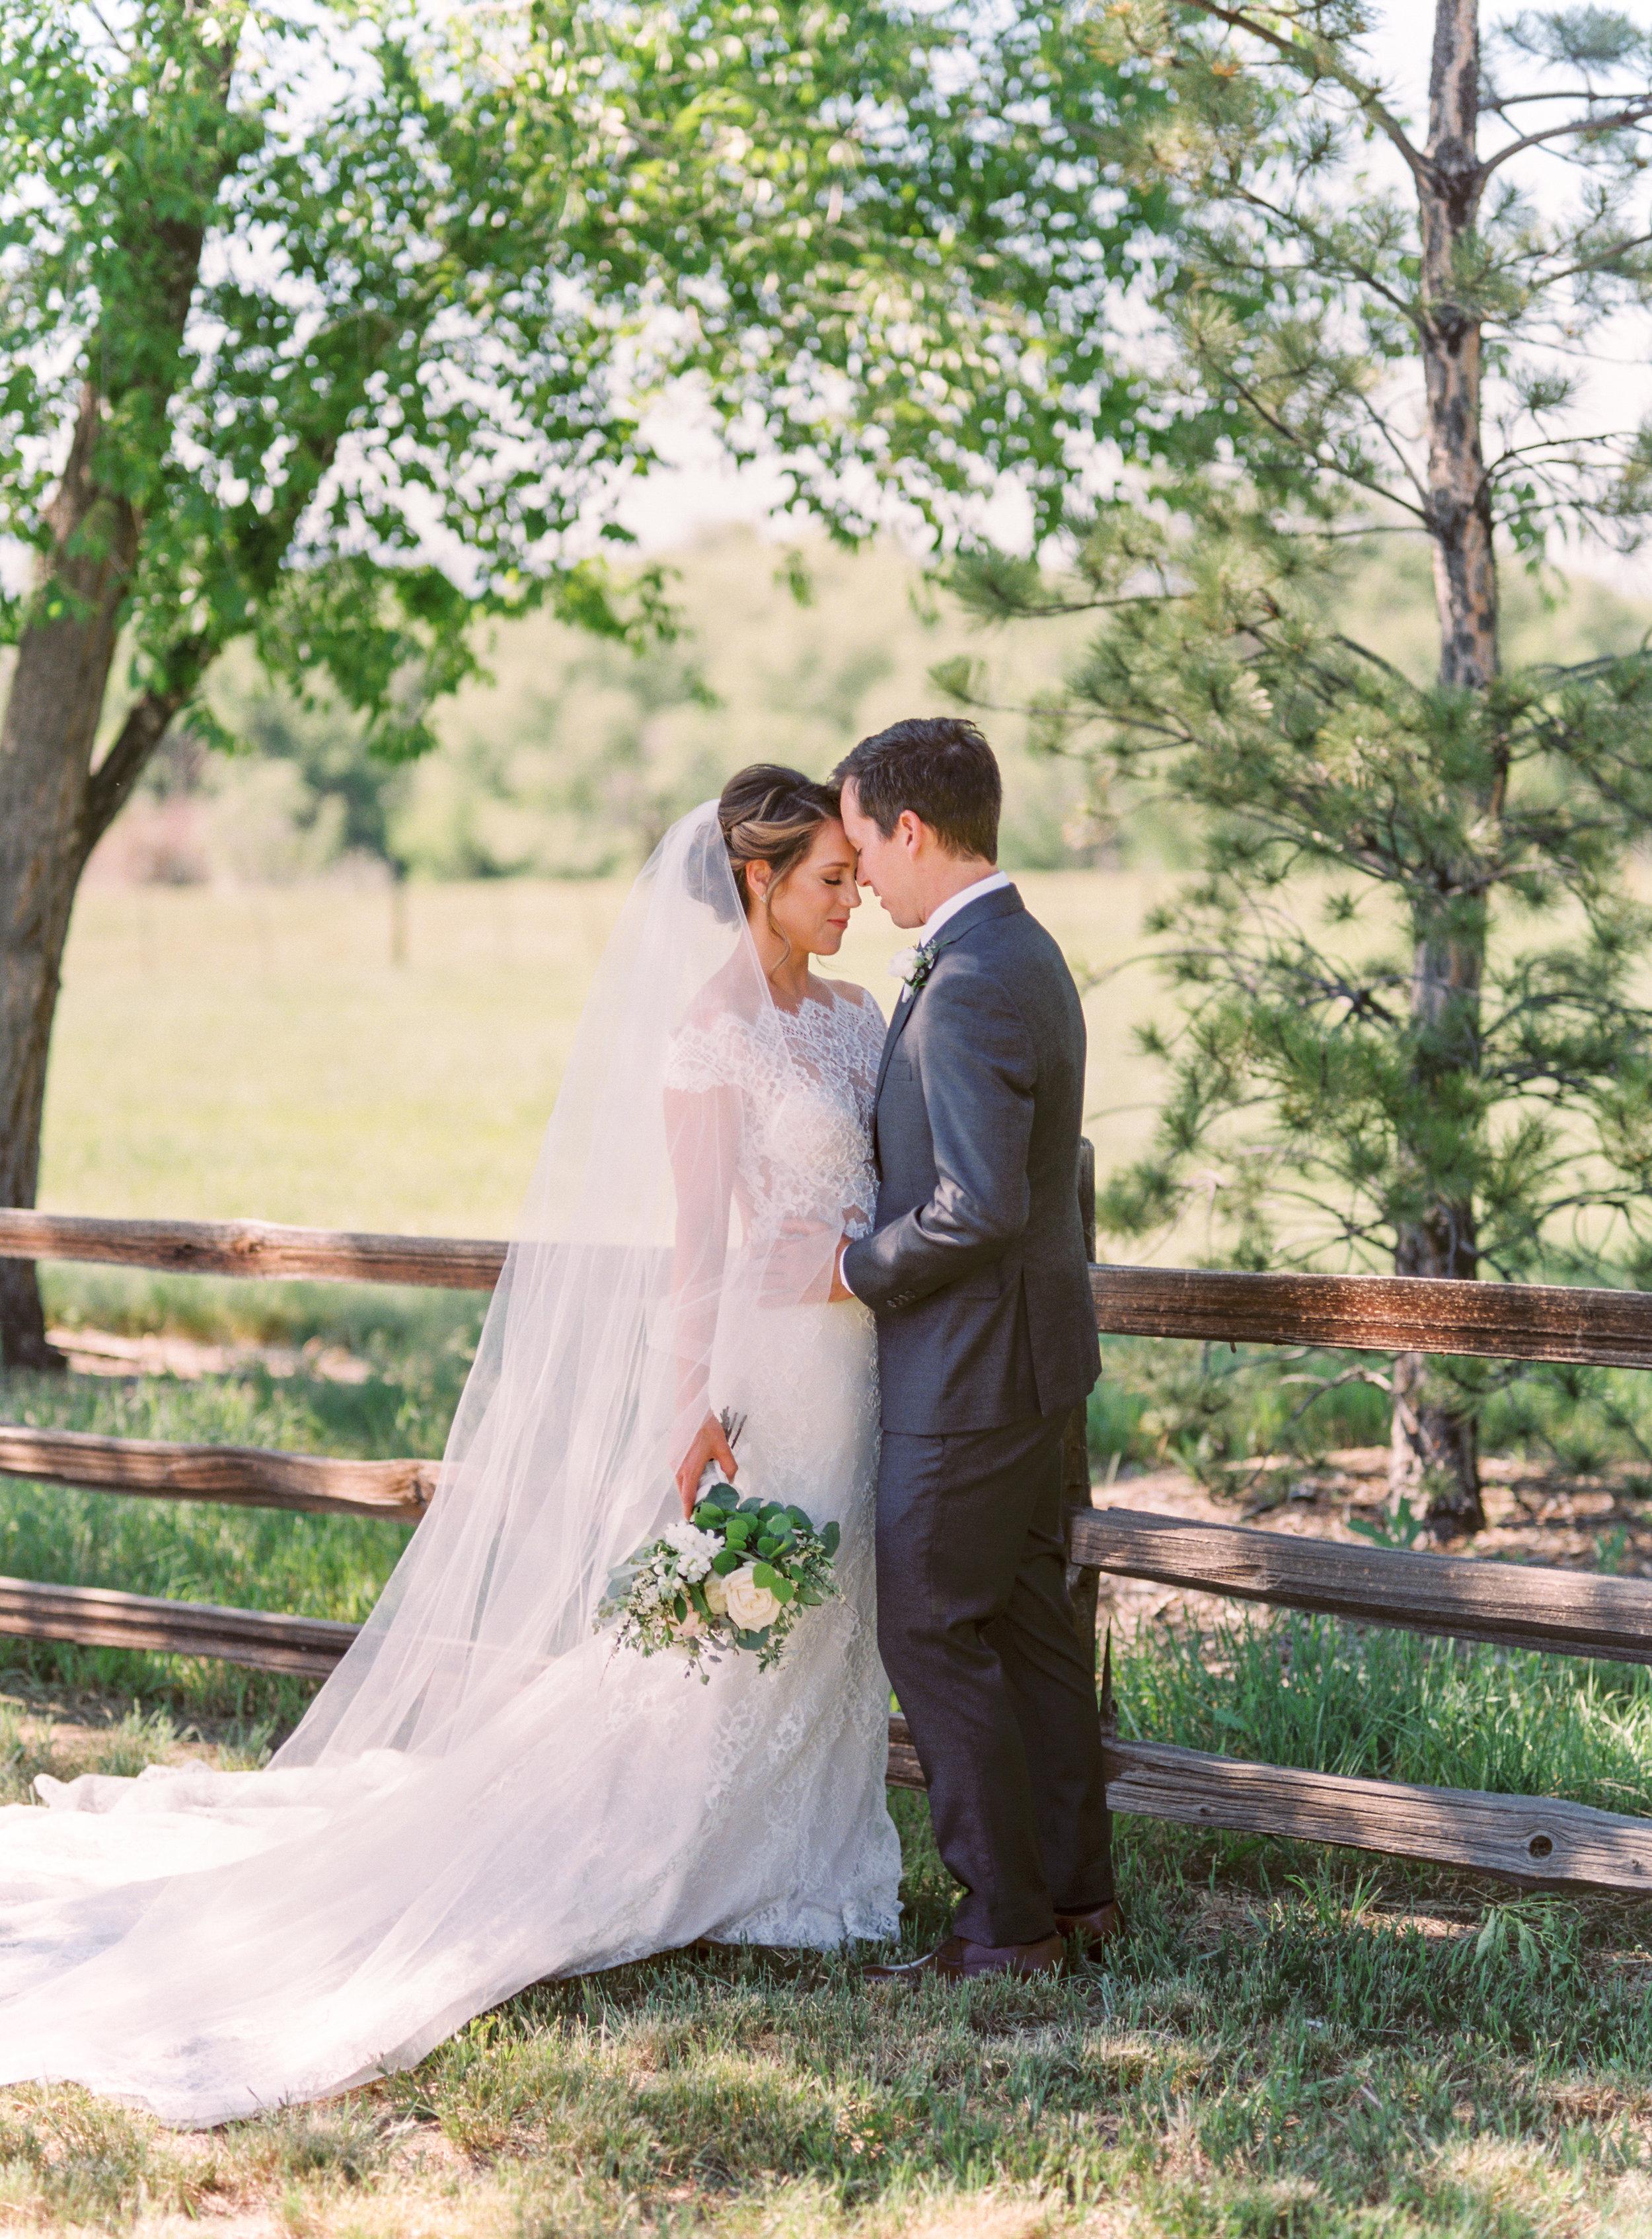 Kathryn-Allen-Boulder-wedding-2018-by-Lisa-ODwyer-107.jpg